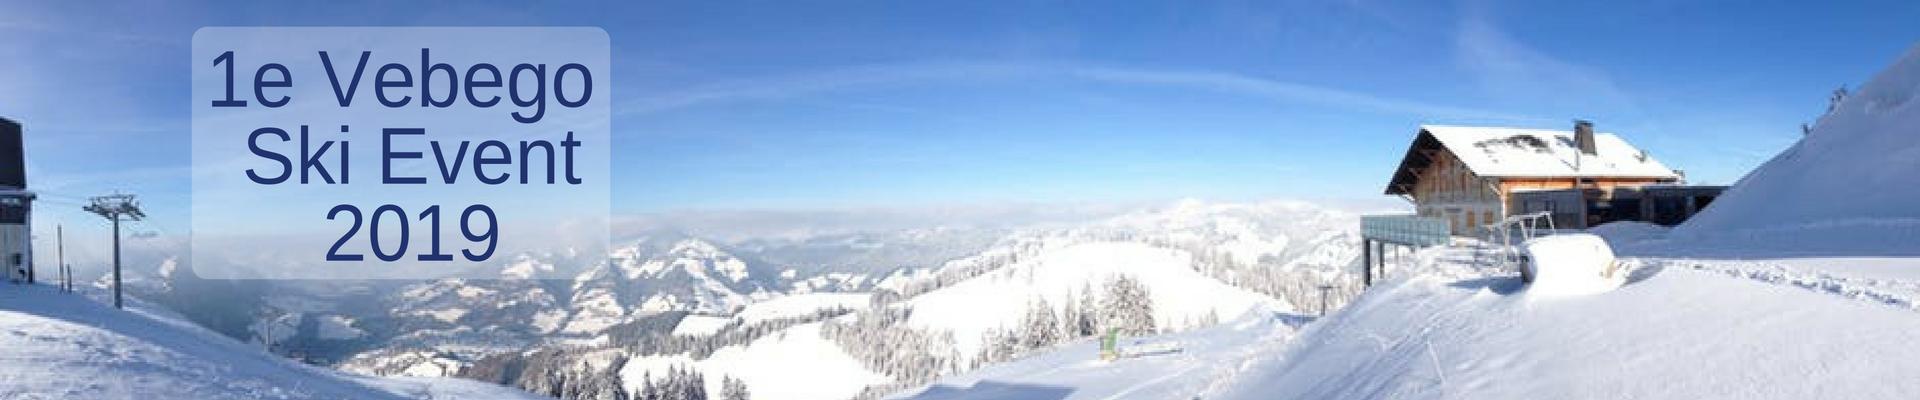 Vebego Ski Event